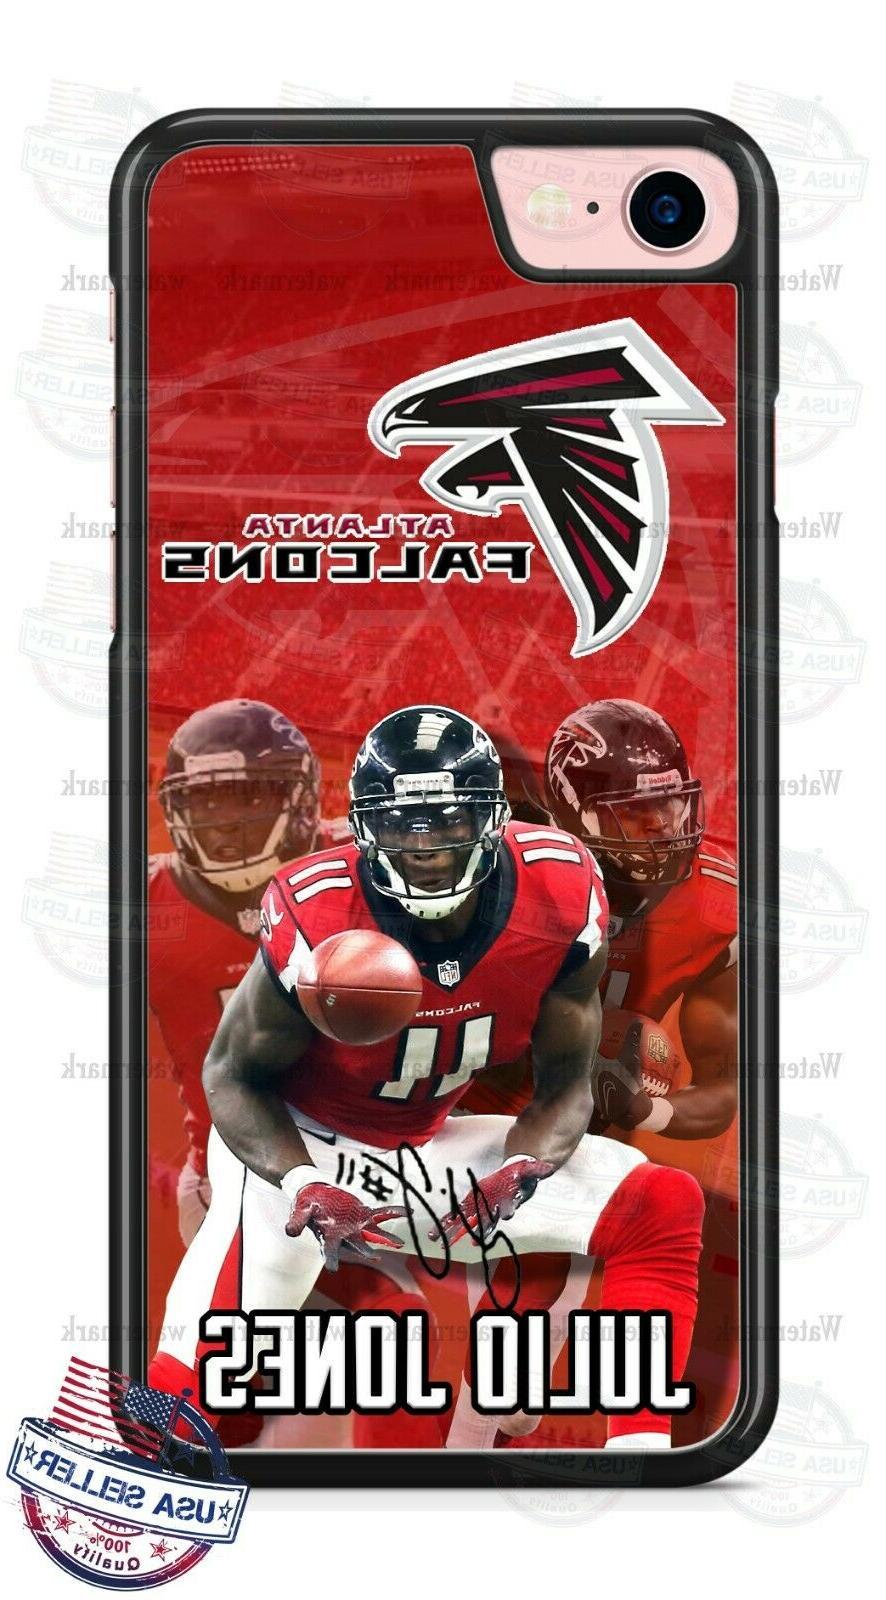 Atlanta Falcons Football Julio Jones Phone Case Cover For iP